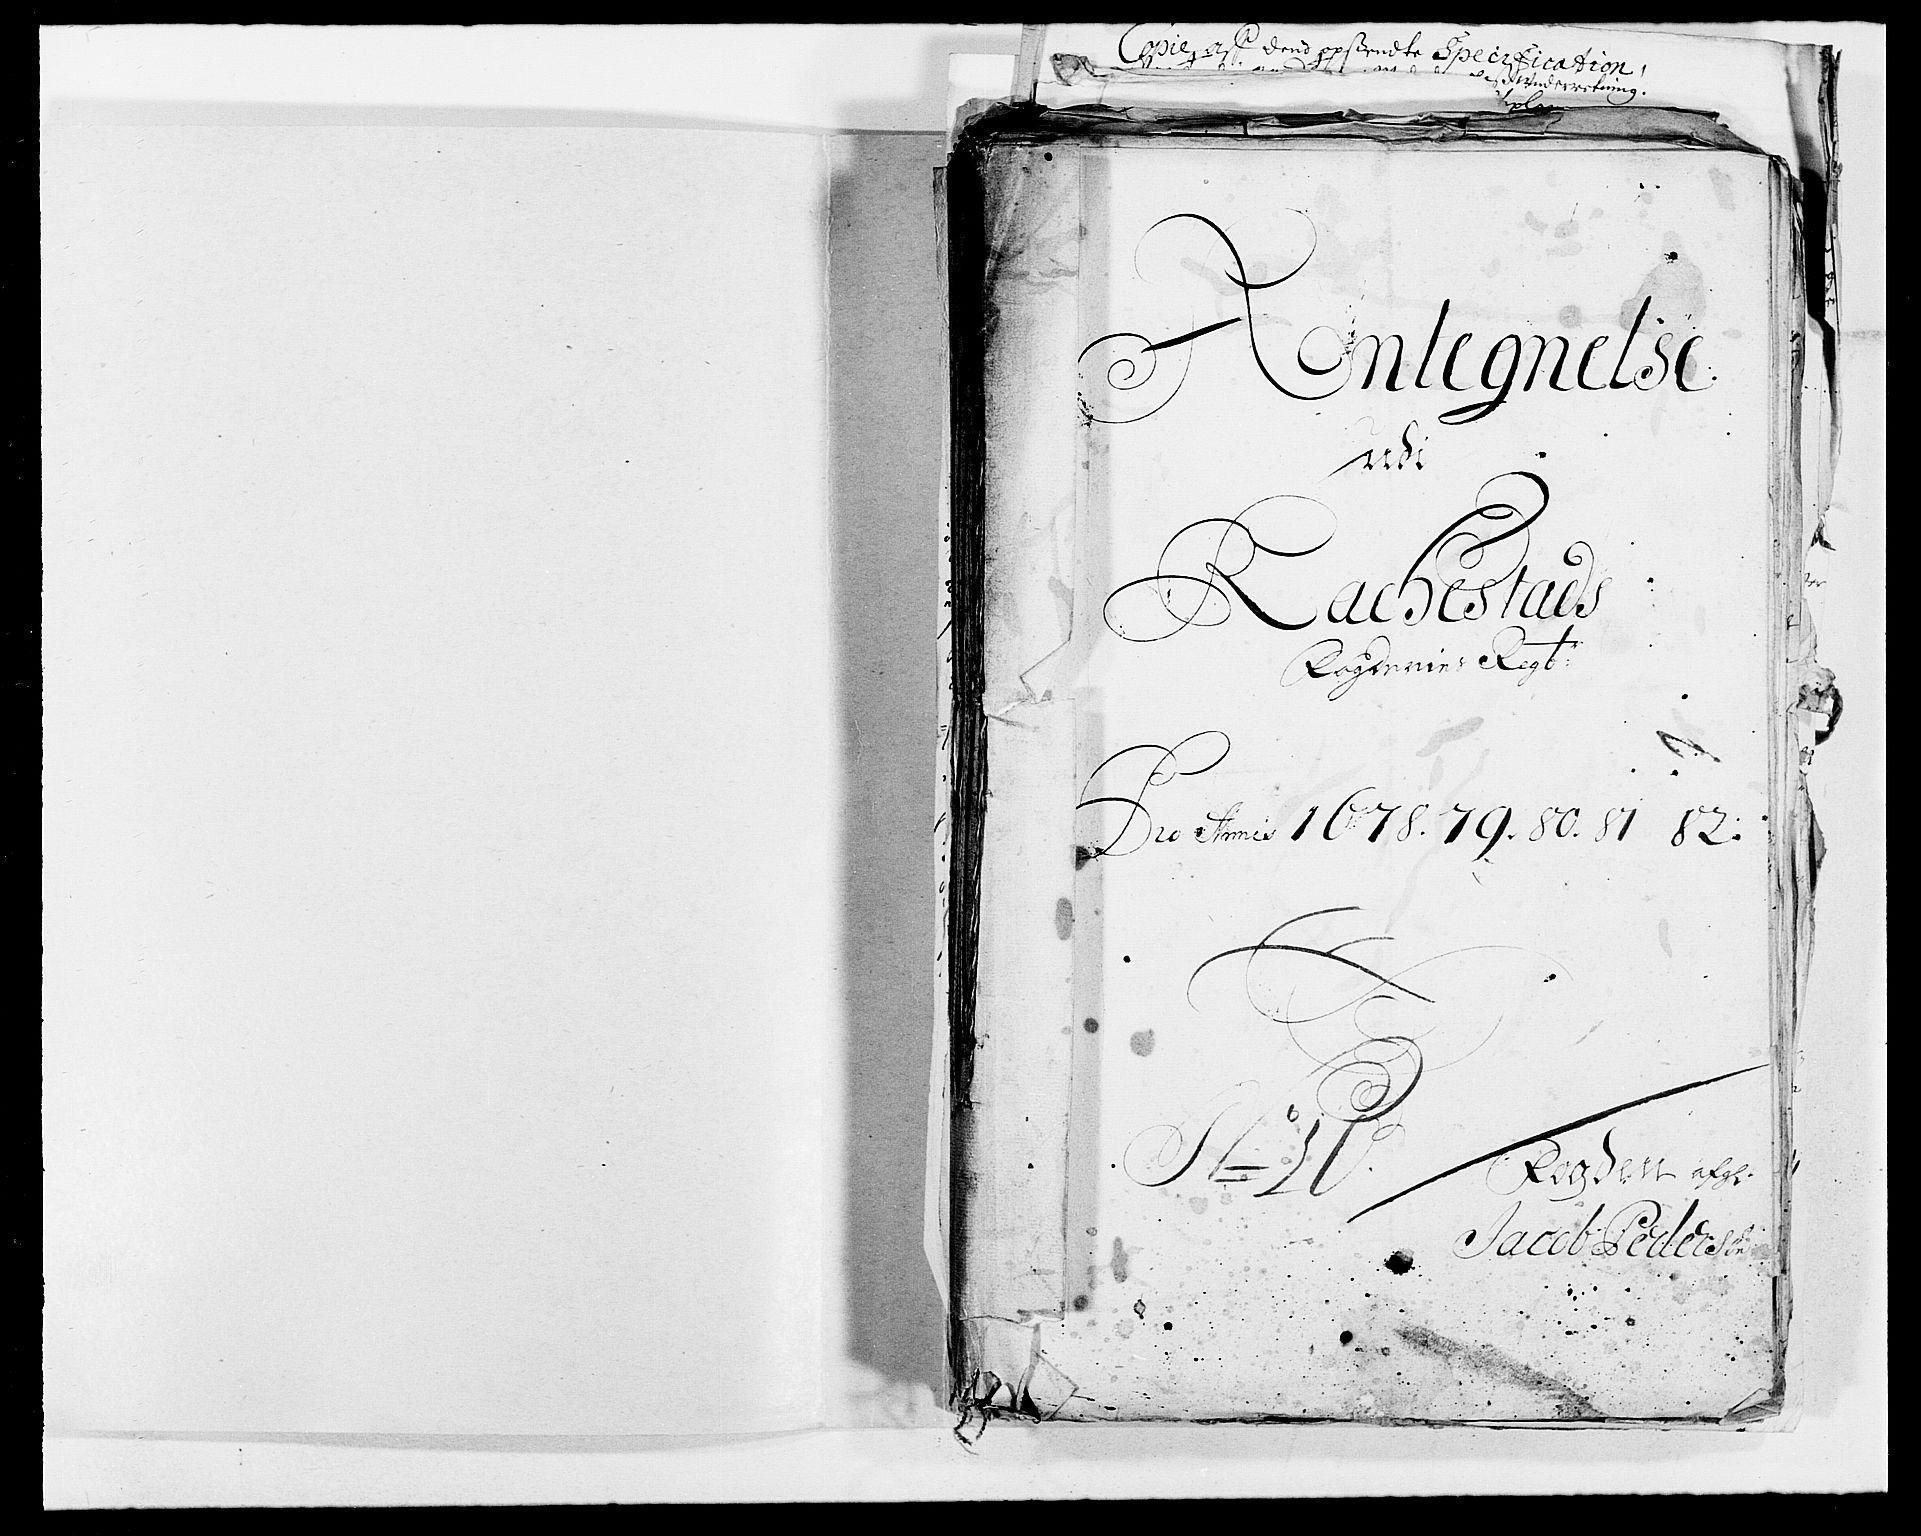 RA, Rentekammeret inntil 1814, Reviderte regnskaper, Fogderegnskap, R05/L0273: Fogderegnskap Rakkestad, 1682, s. 208